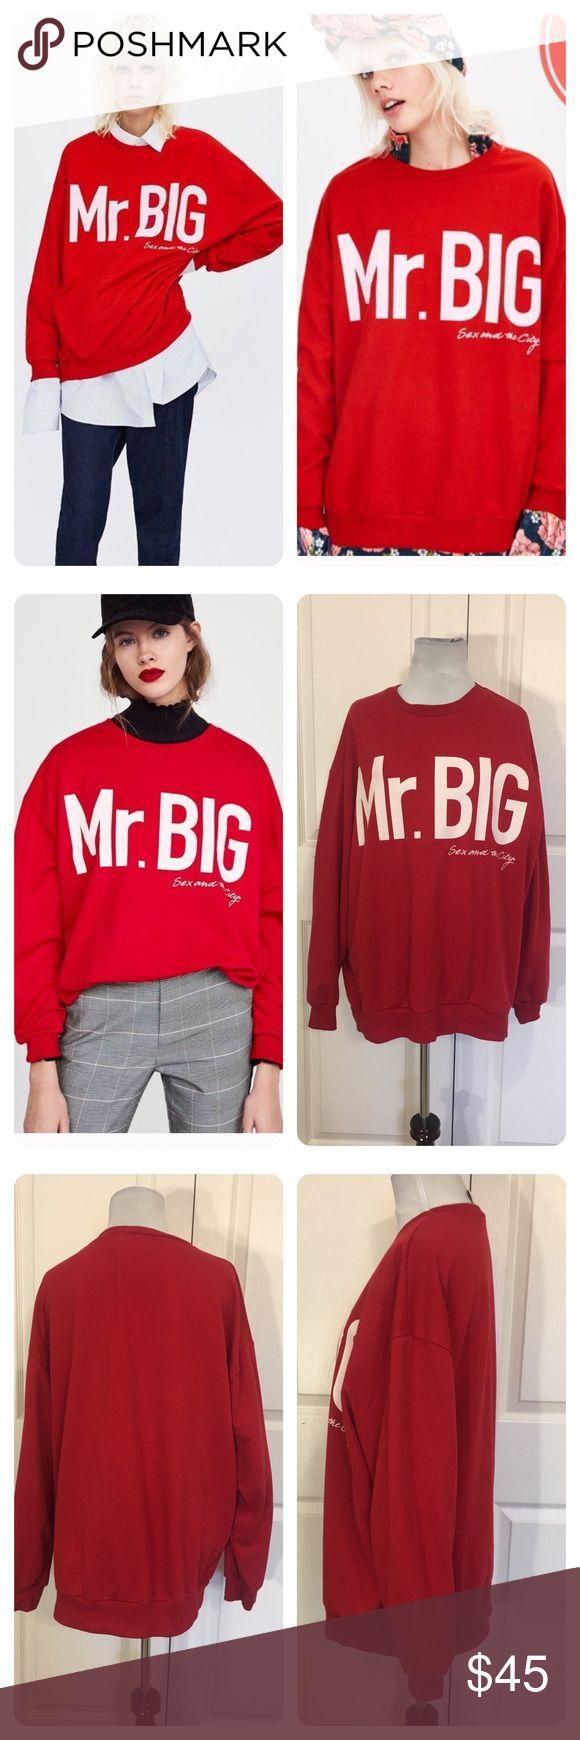 8b11a326 Zara Sex and the City Mr. Big Sweatshirt | Women Fashion